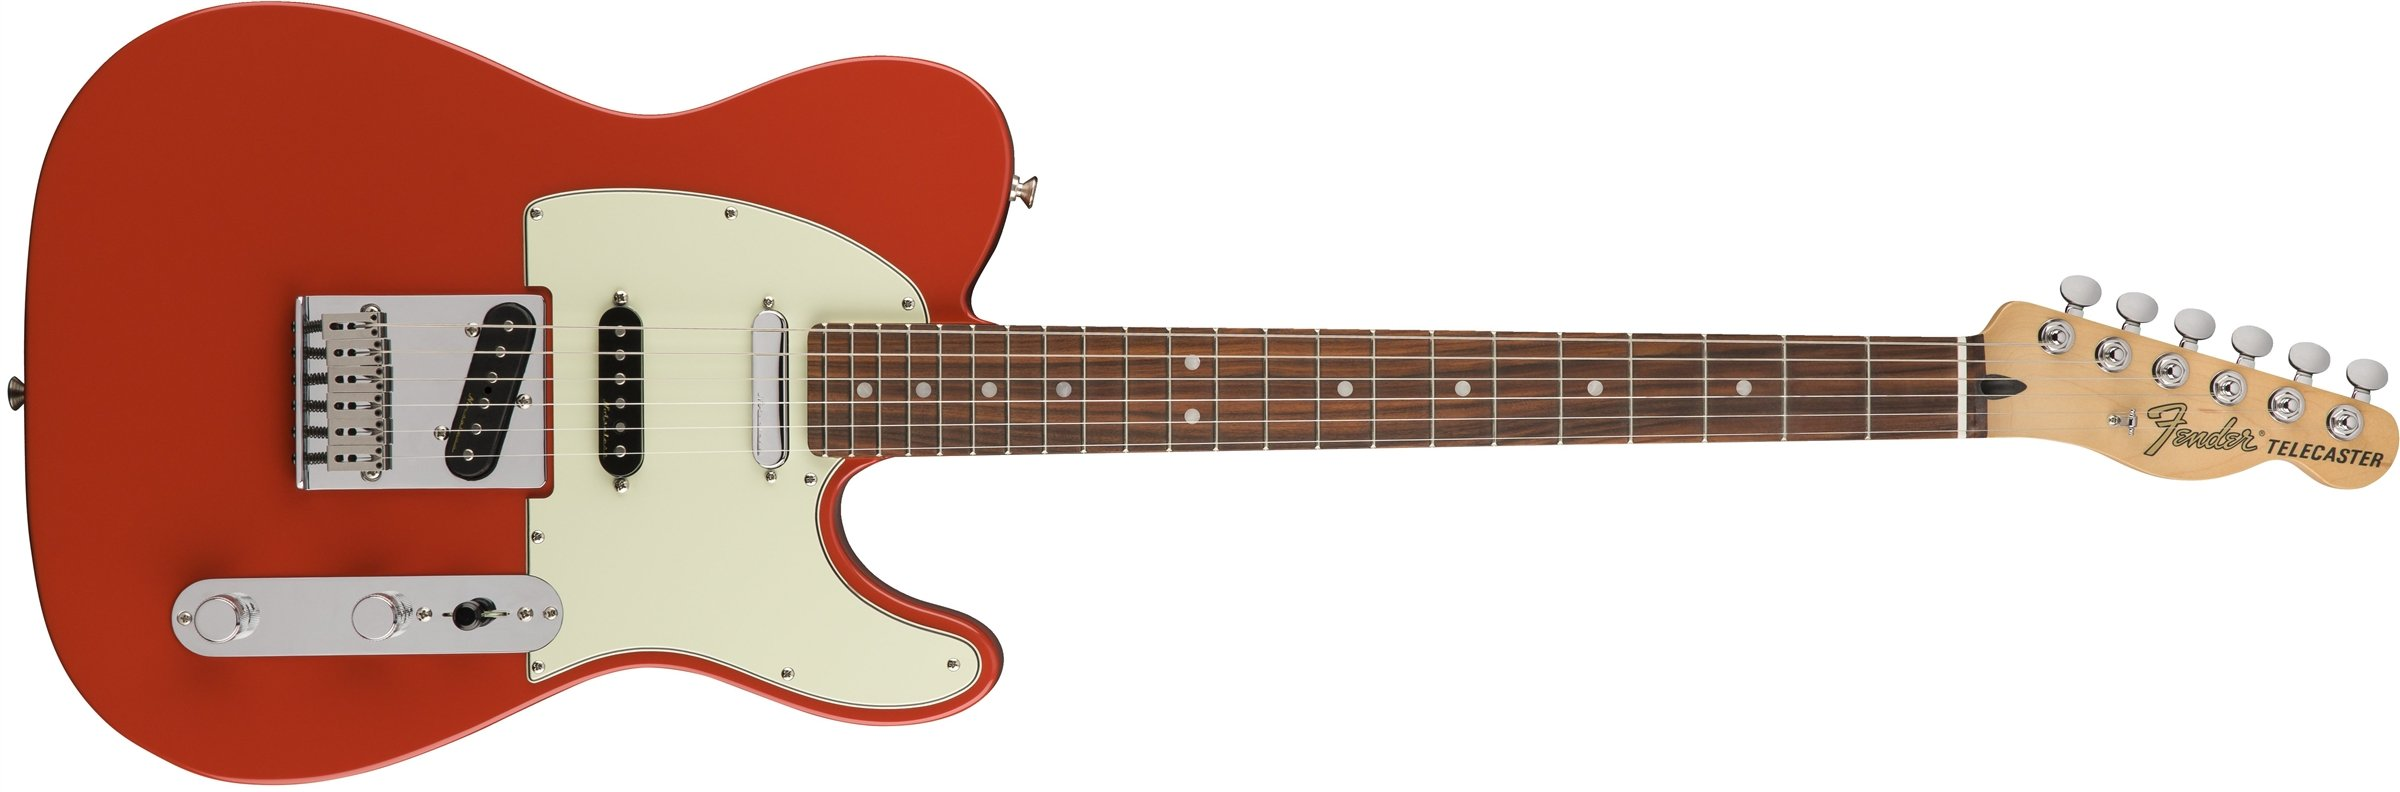 Cheap Fender Deluxe Nashville Telecaster Electric Guitar - Pau Ferro Fingerboard - Fiesta Red Black Friday & Cyber Monday 2019